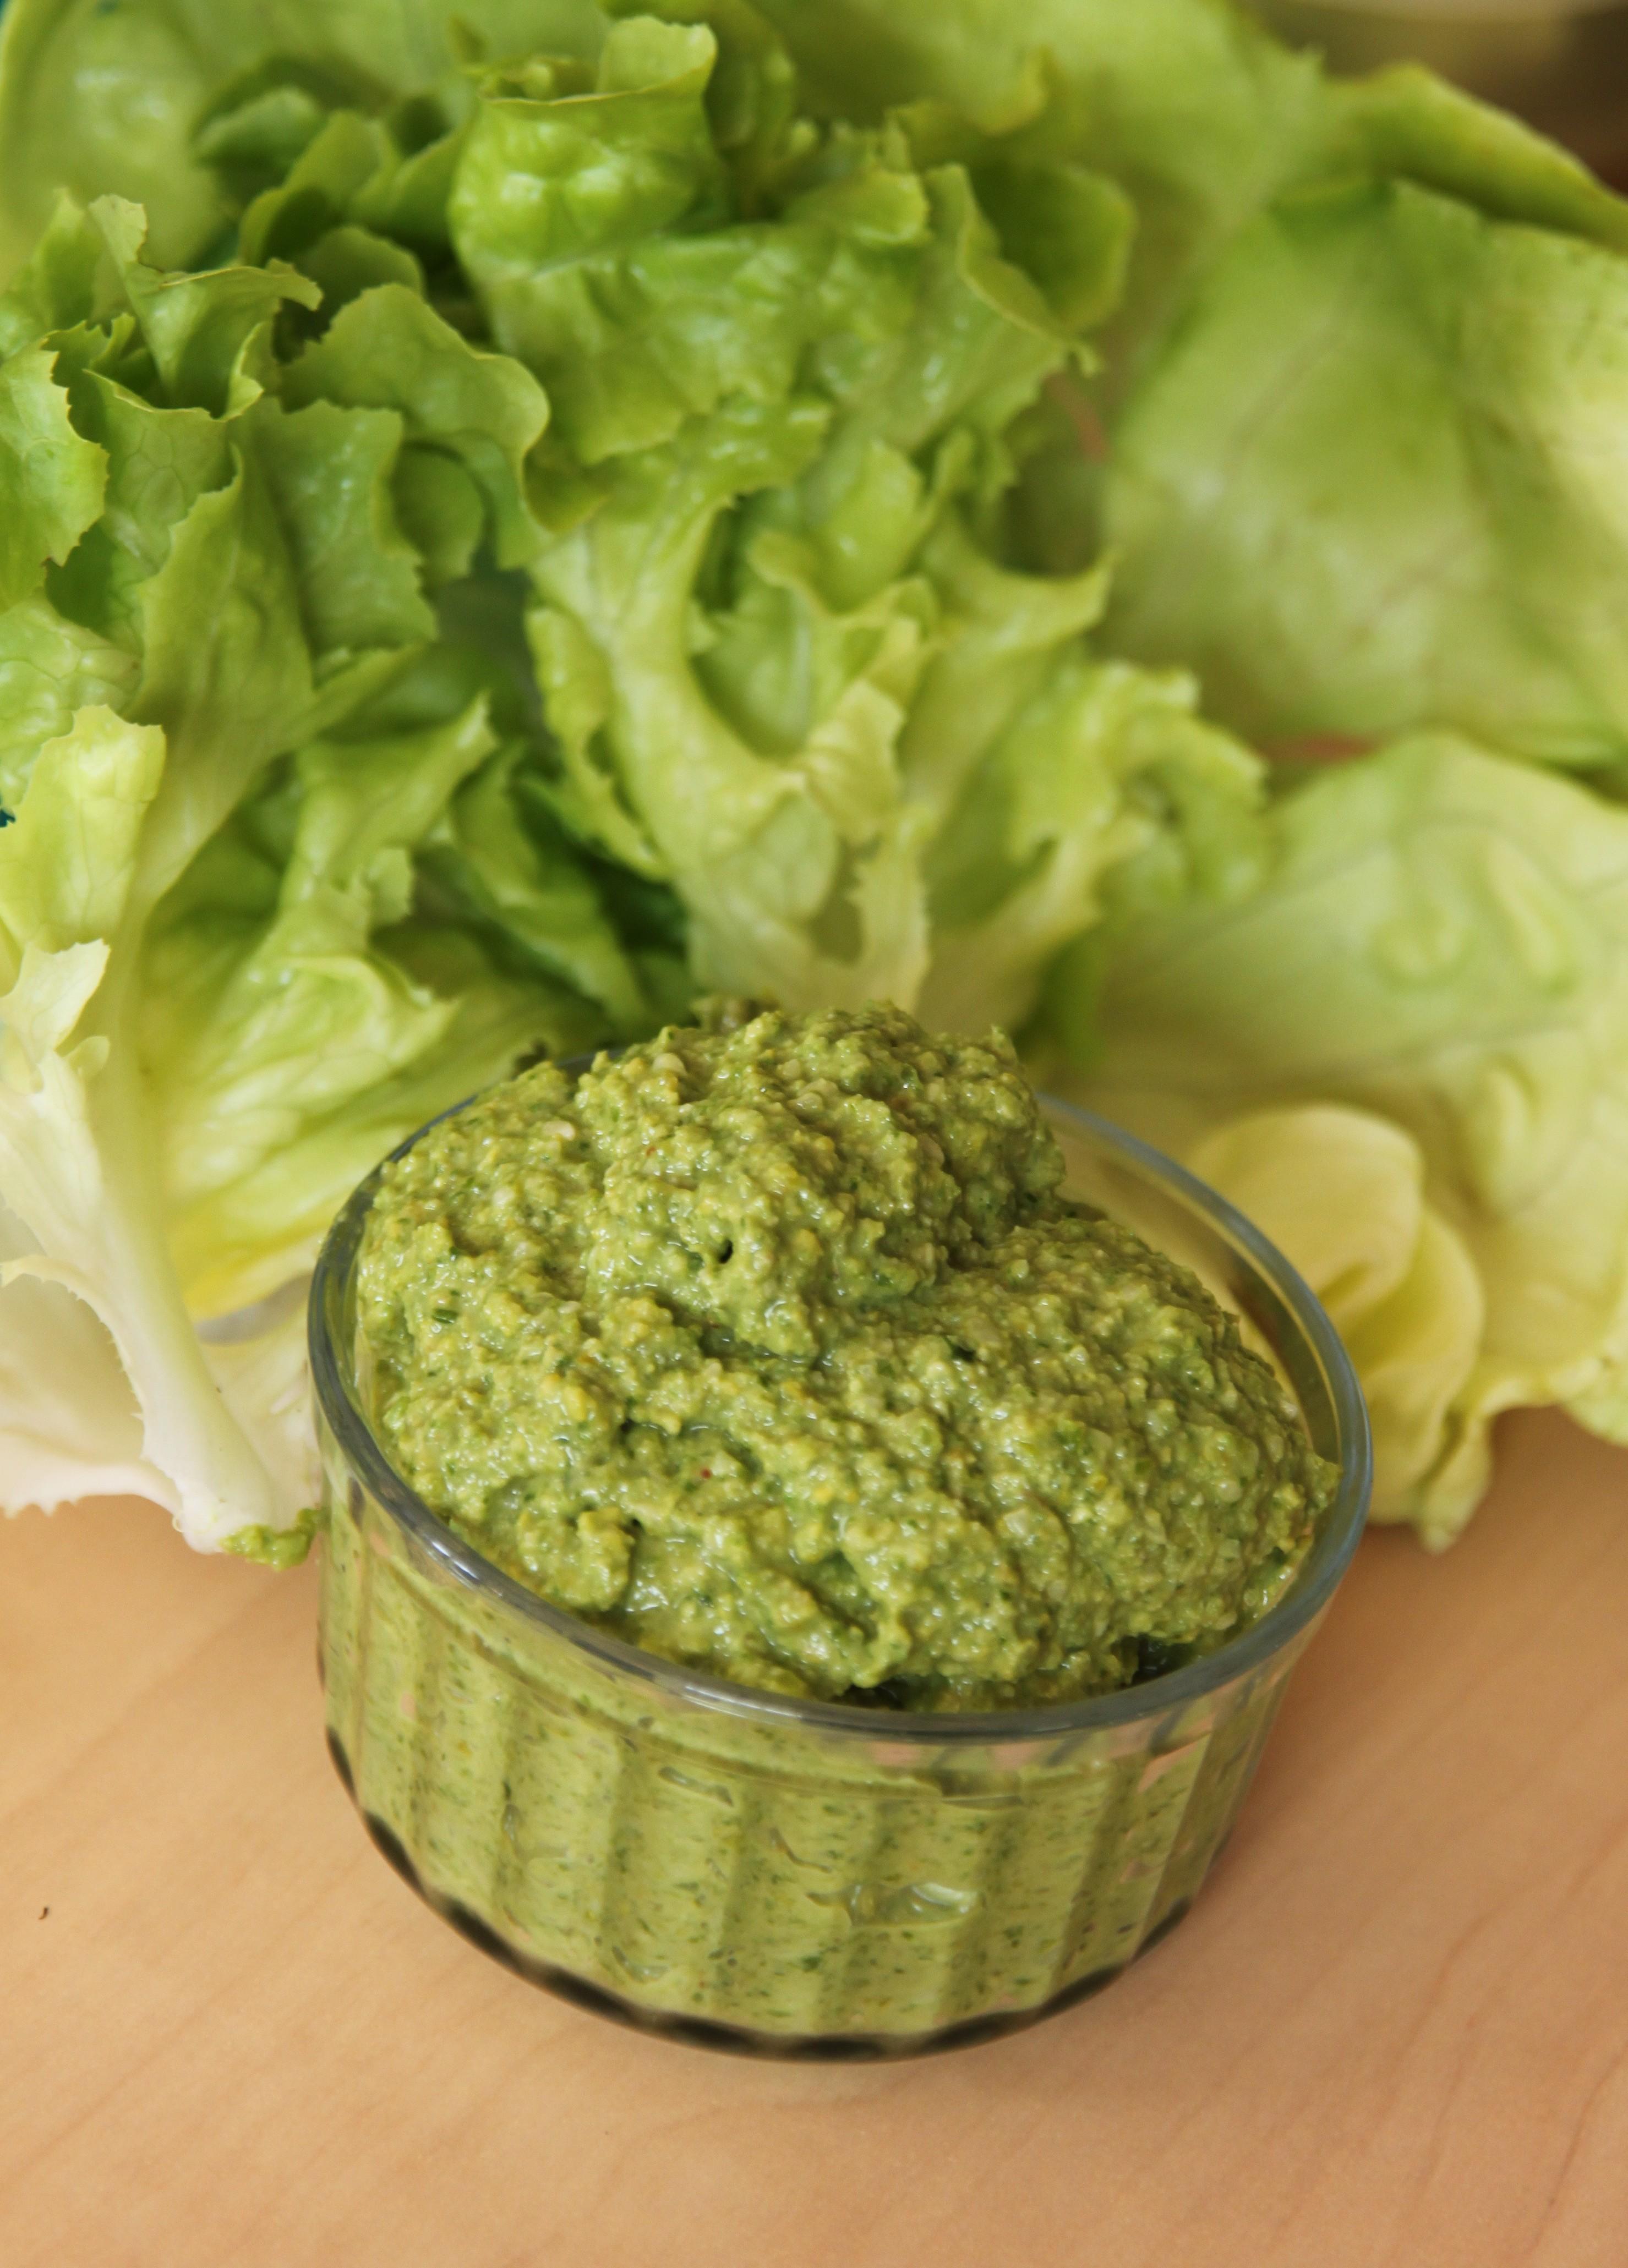 Pesto de salade verte laitue et feuille de ch ne la pistache bocook - Accompagnement salade verte ...